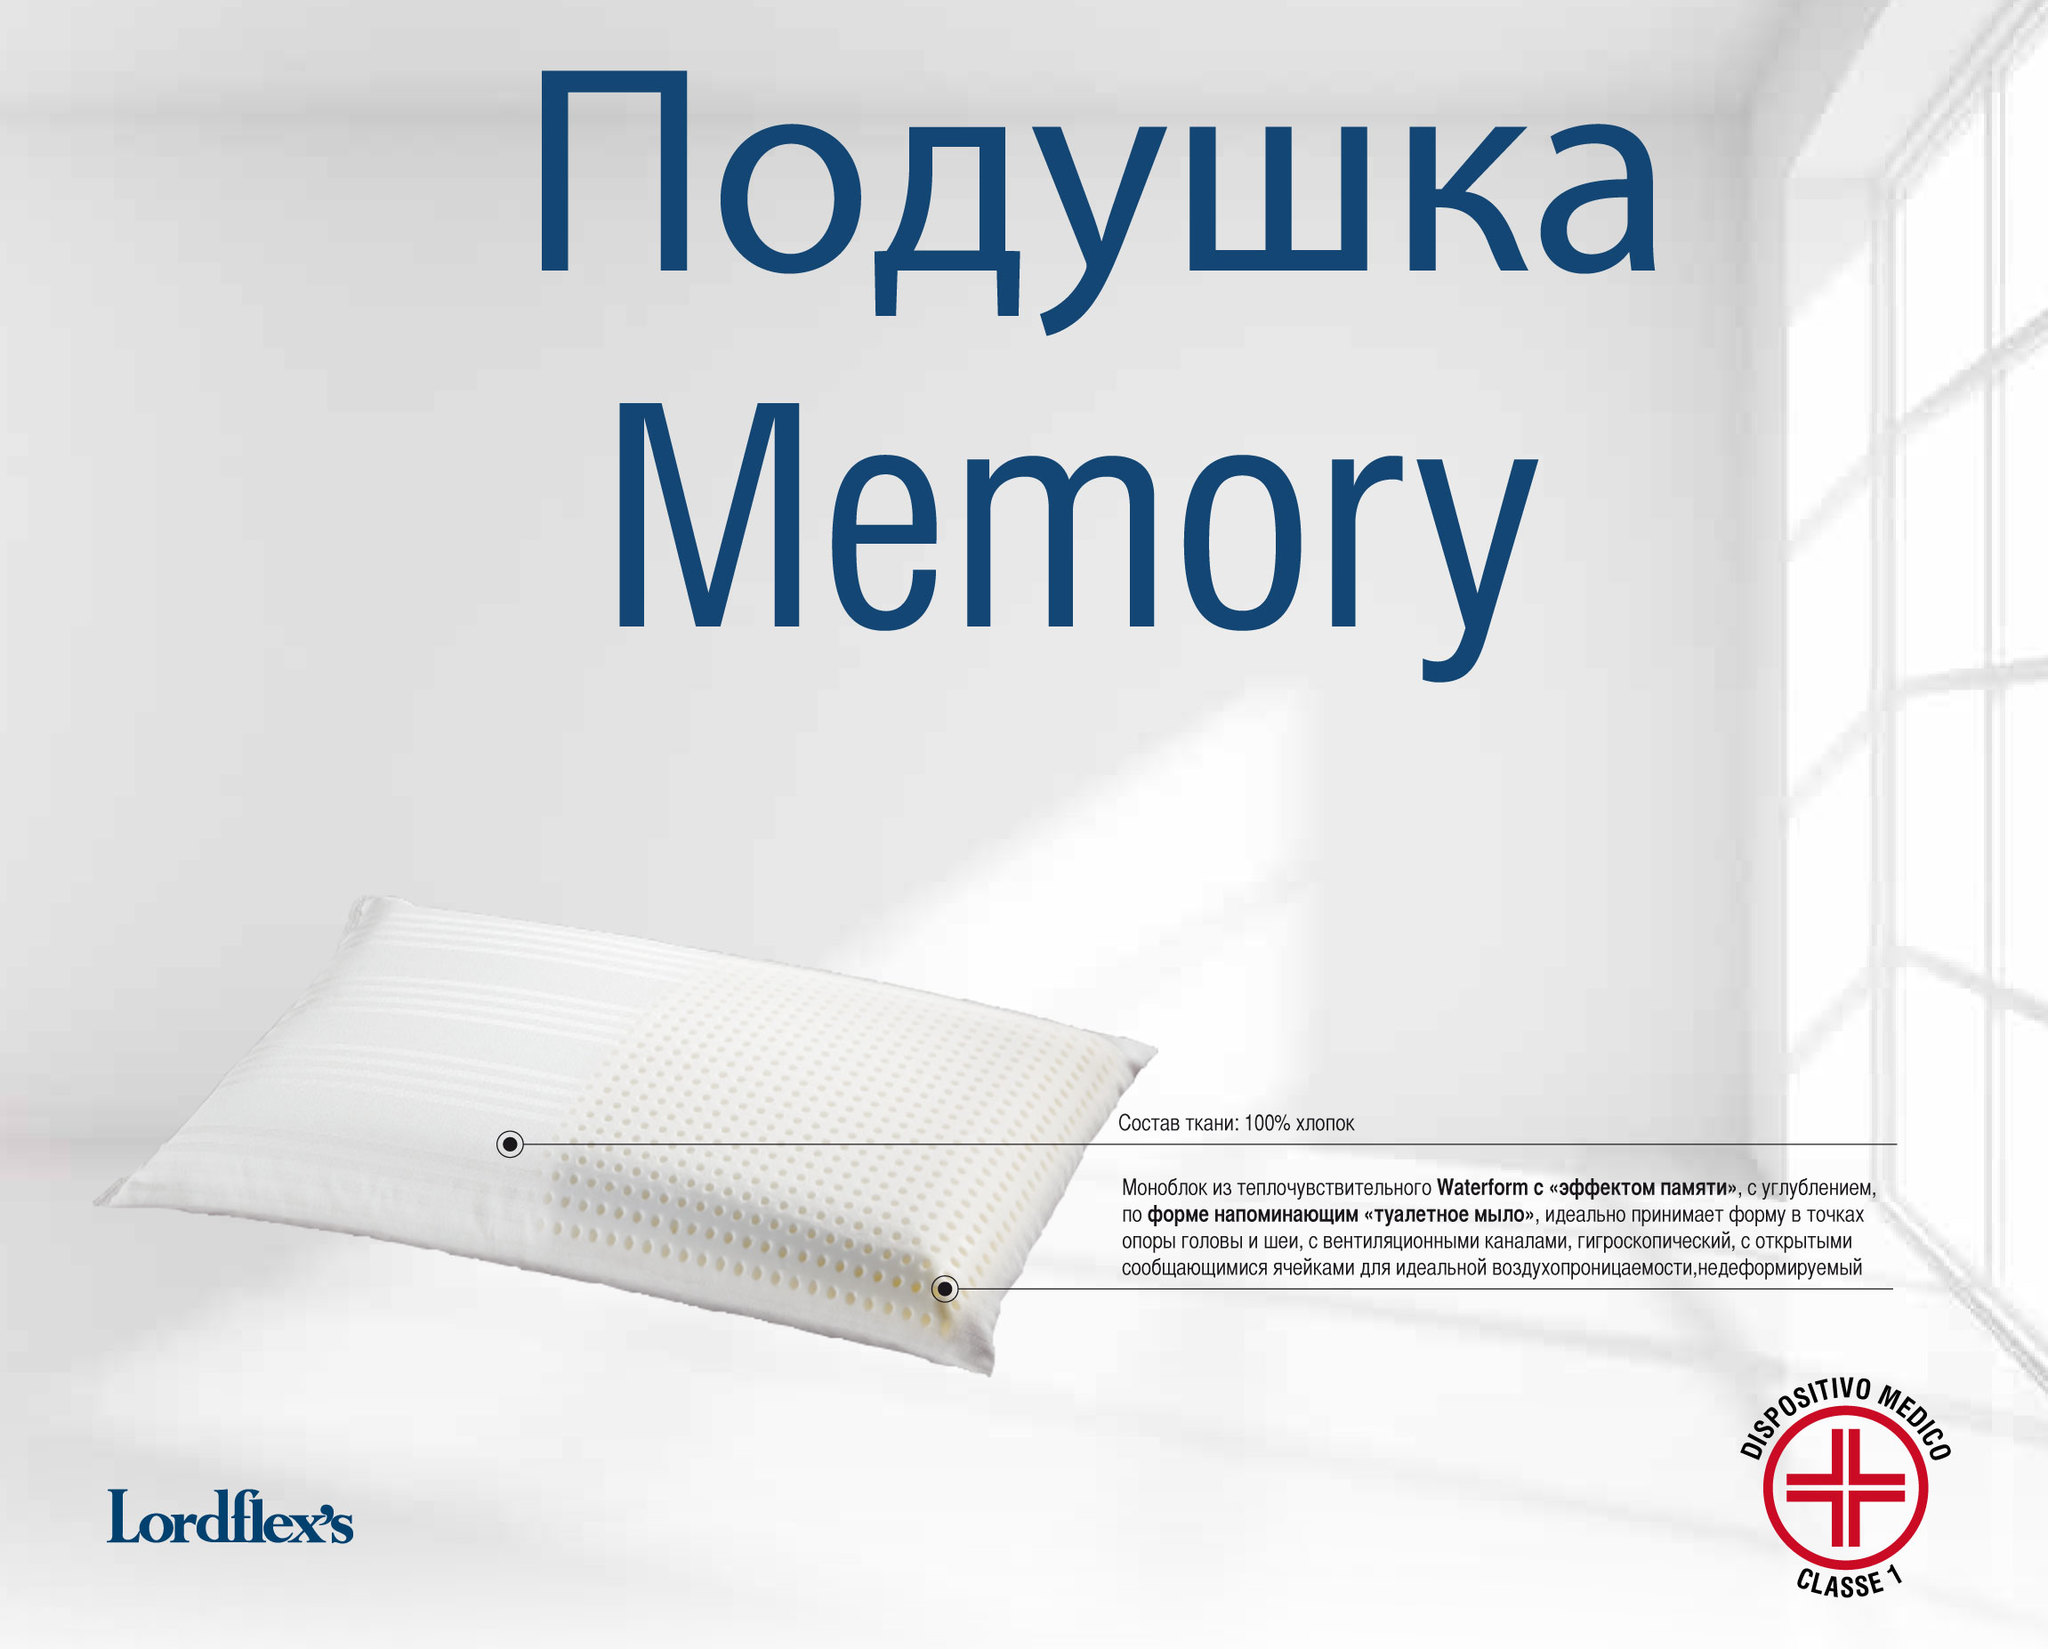 Подушки для сна Подушка 45х75 Lordflex's Memory Guanciale-Memory.jpg